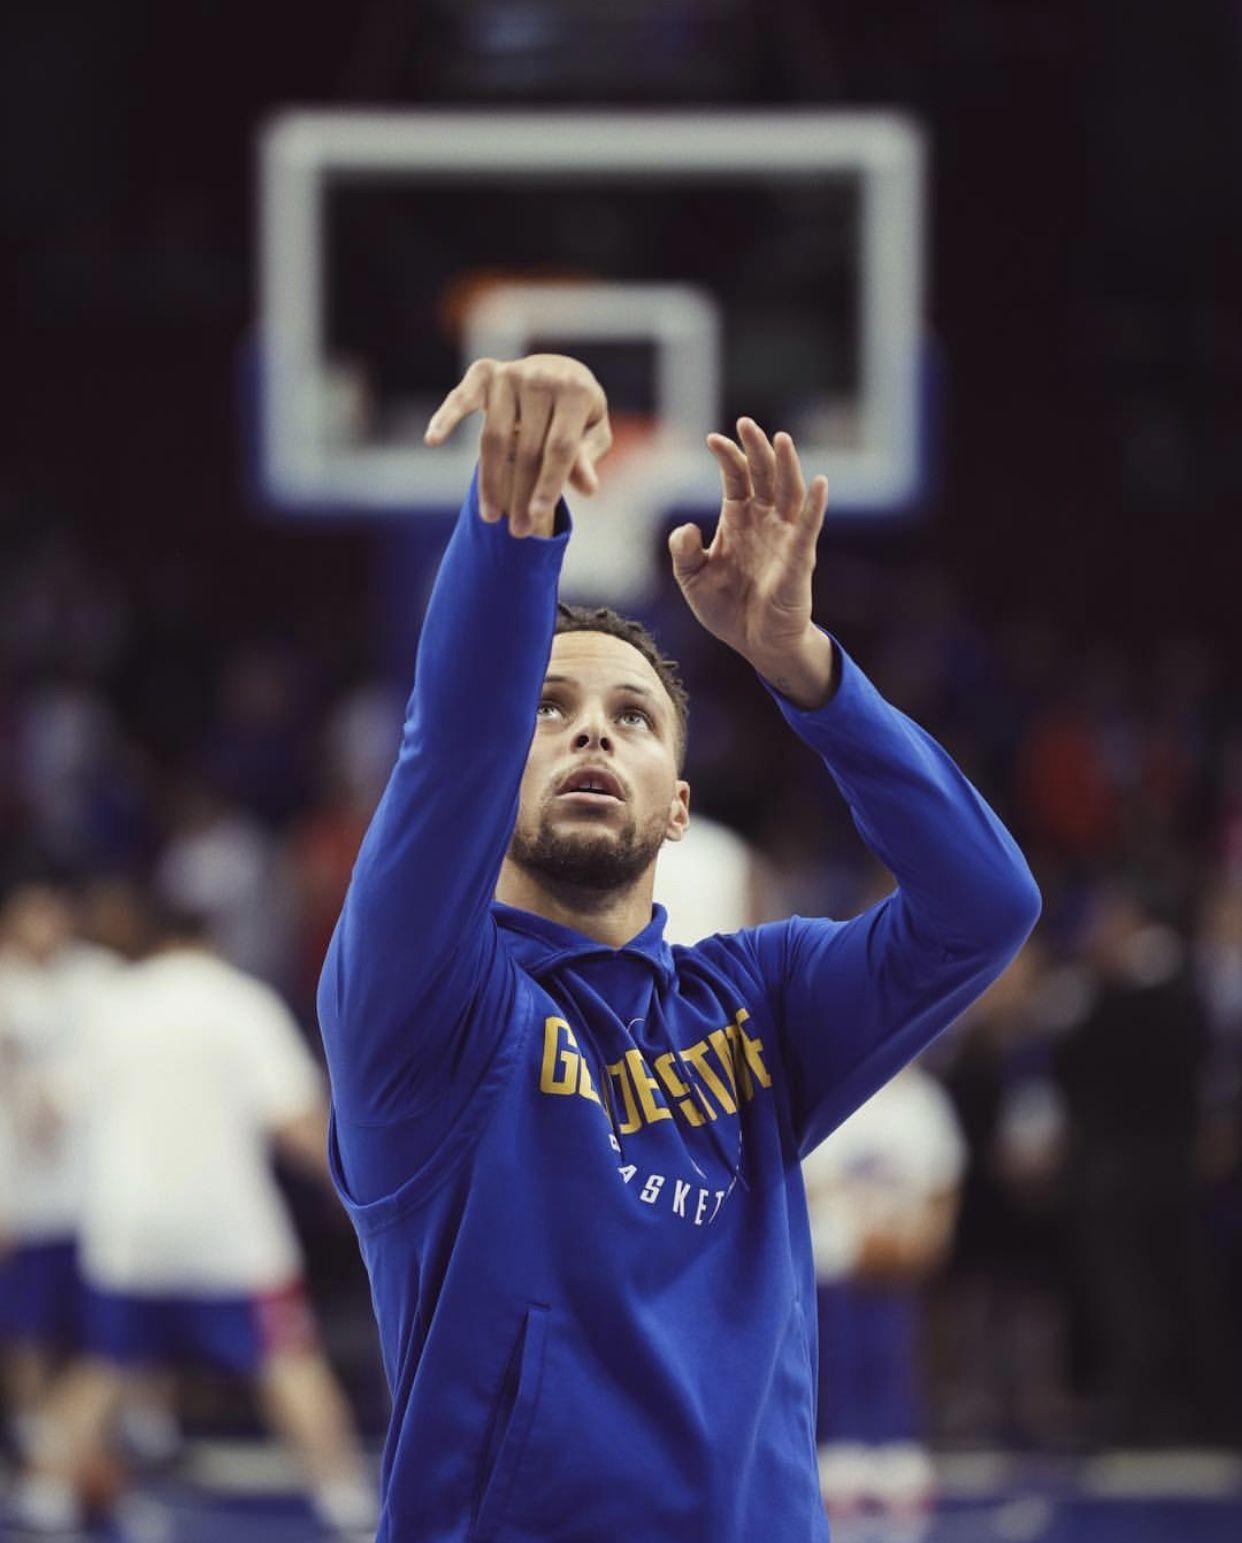 Pregame🔥 Nba stephen curry, Stephen curry basketball